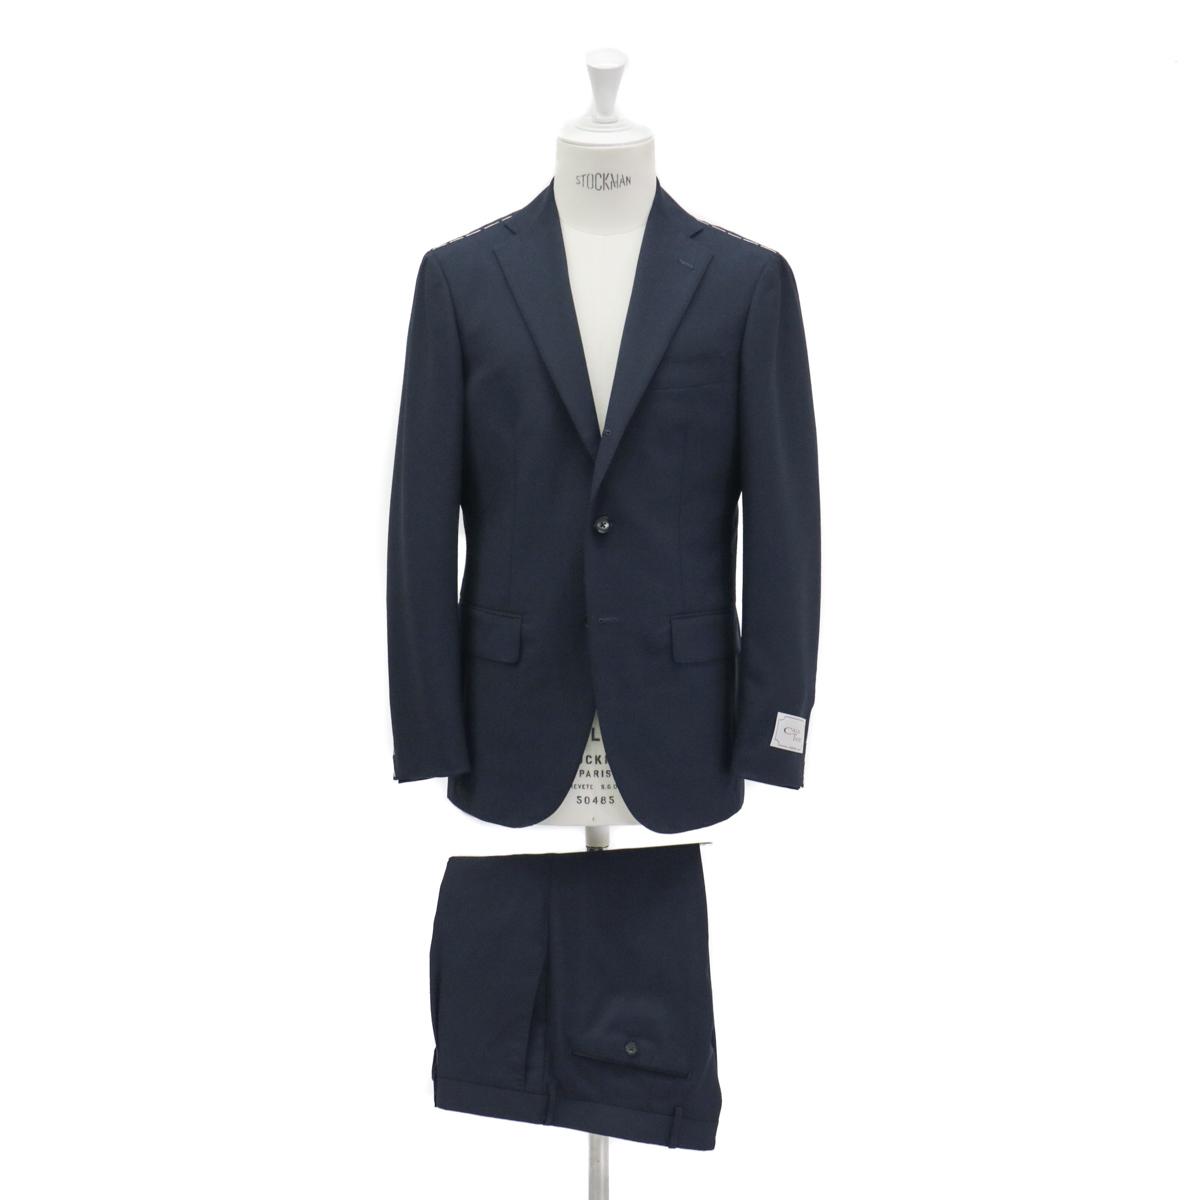 RING JACKET リングヂャケットModel No-184AH S-172HCALM TWIST3Bスーツ【ネイビー】